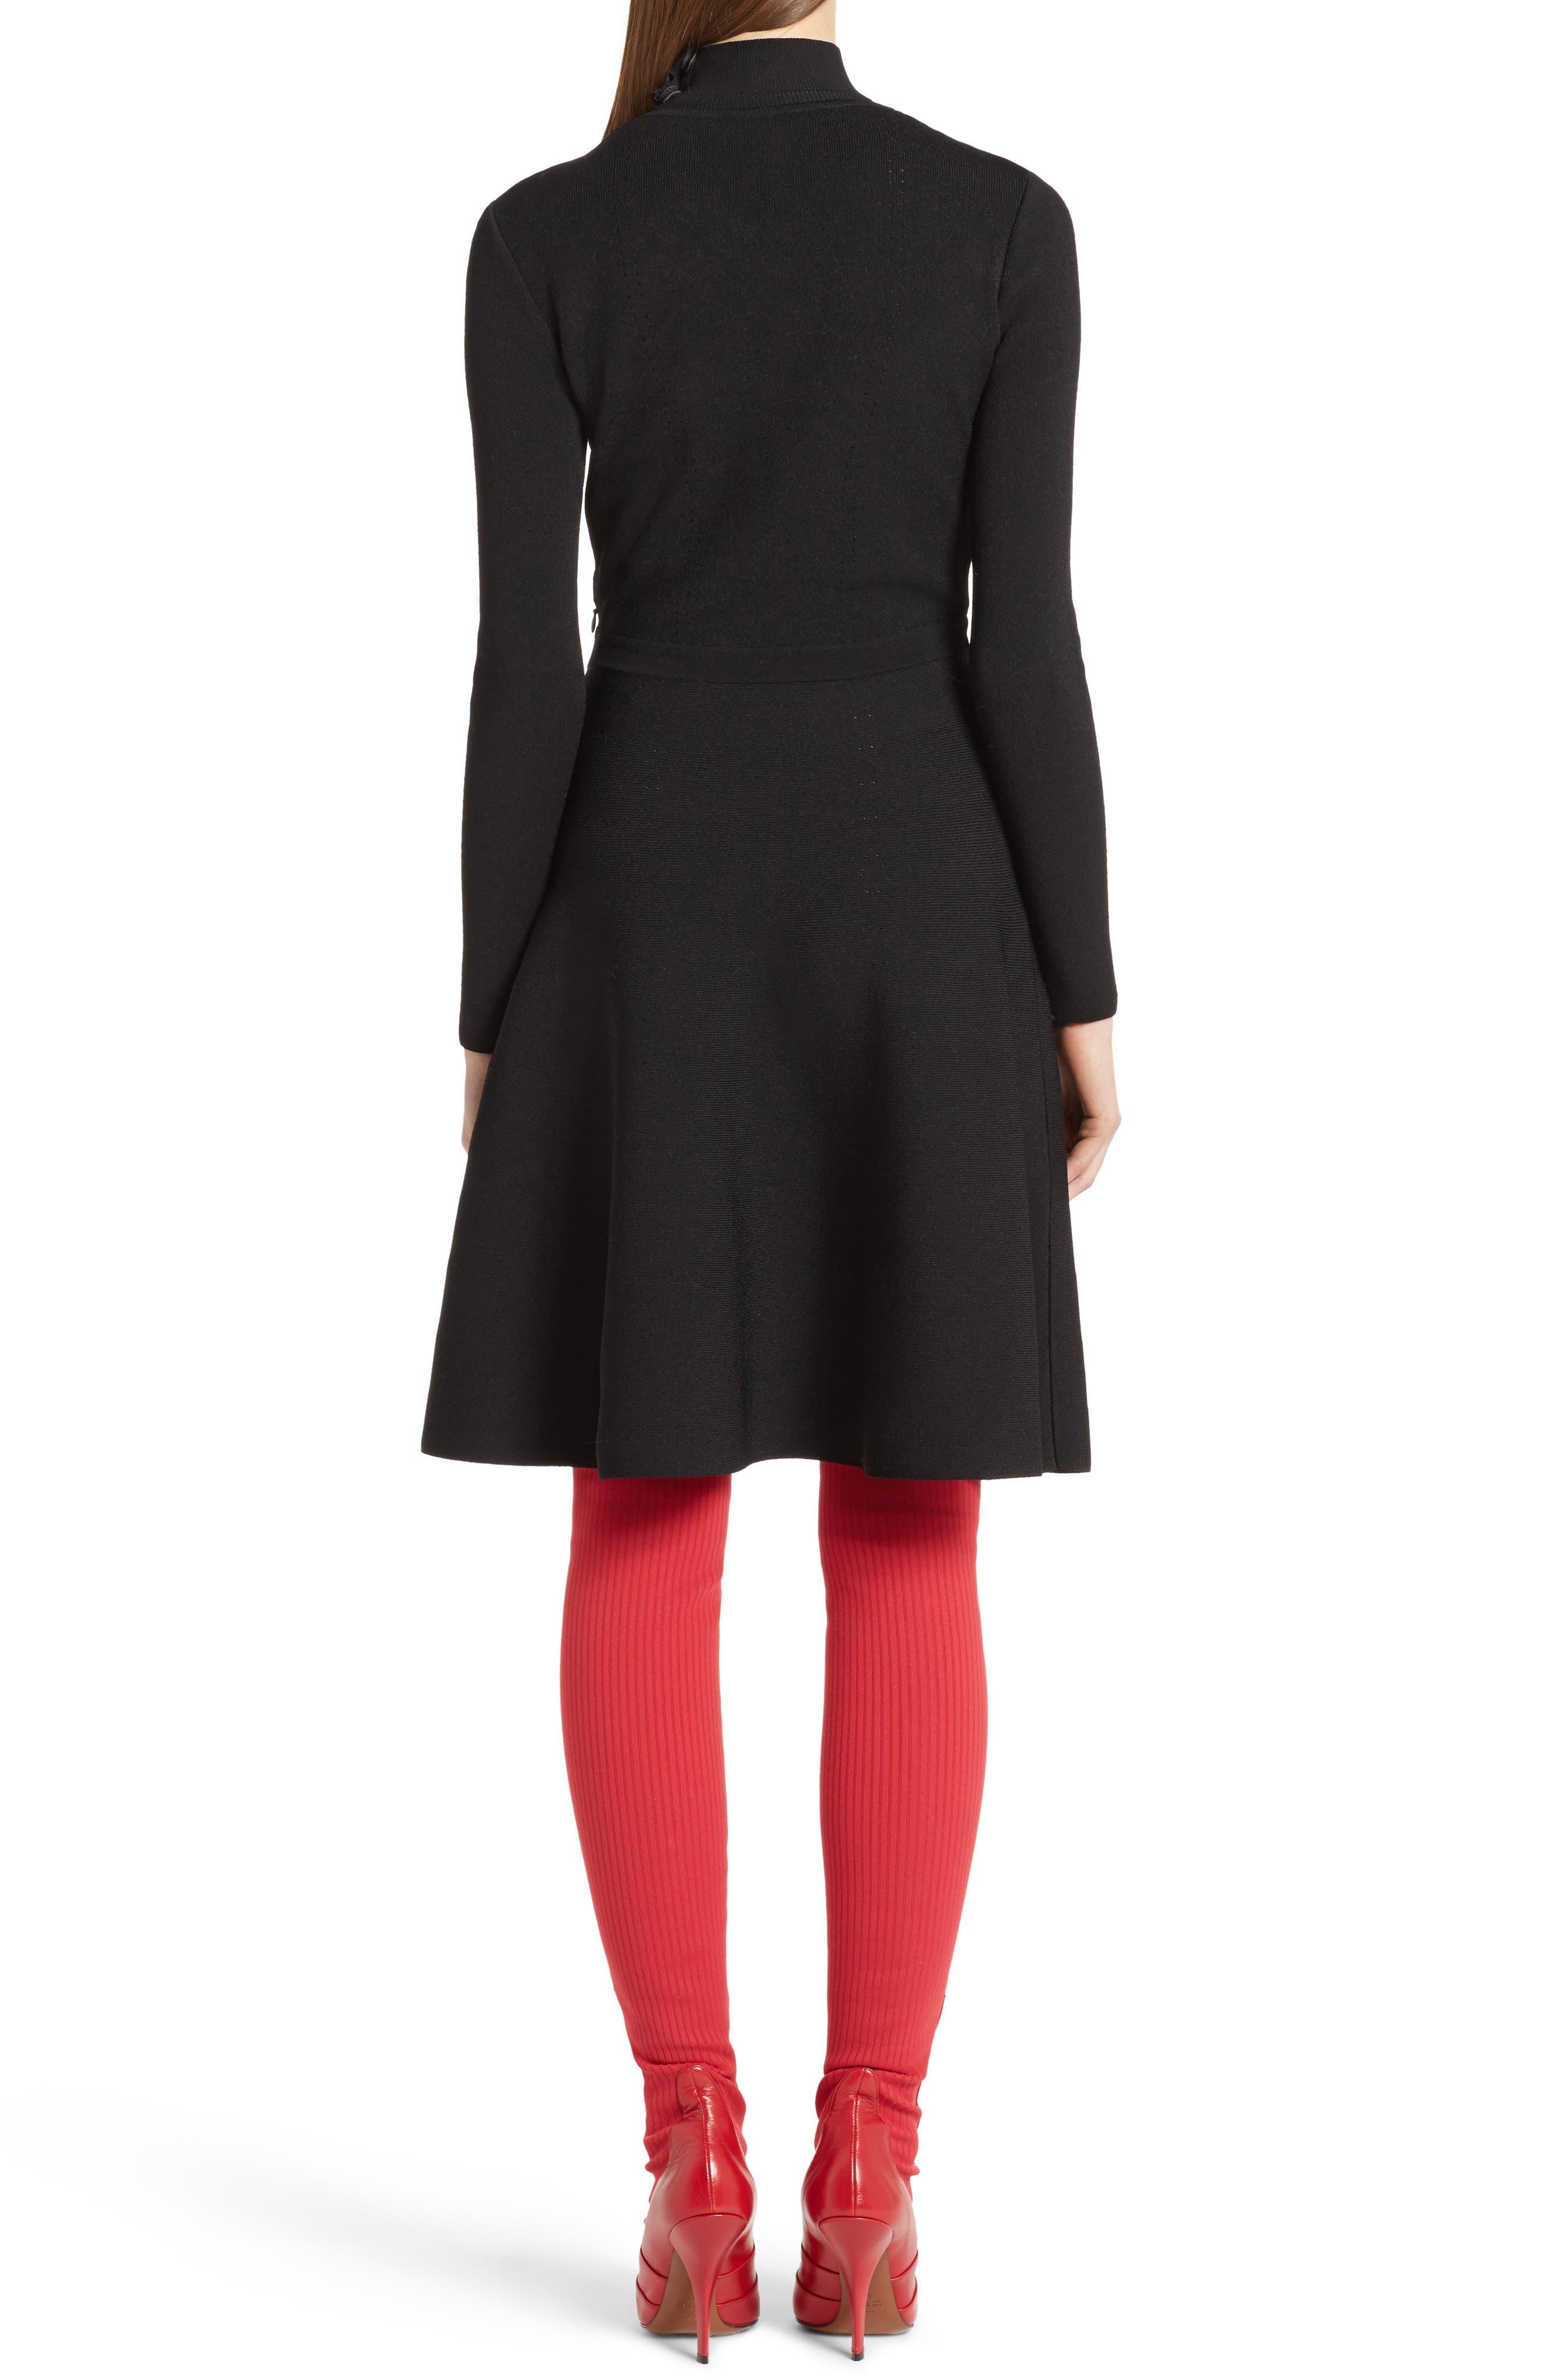 Macramé Inset Knit Dress,                             Alternate thumbnail 2, color,                             001